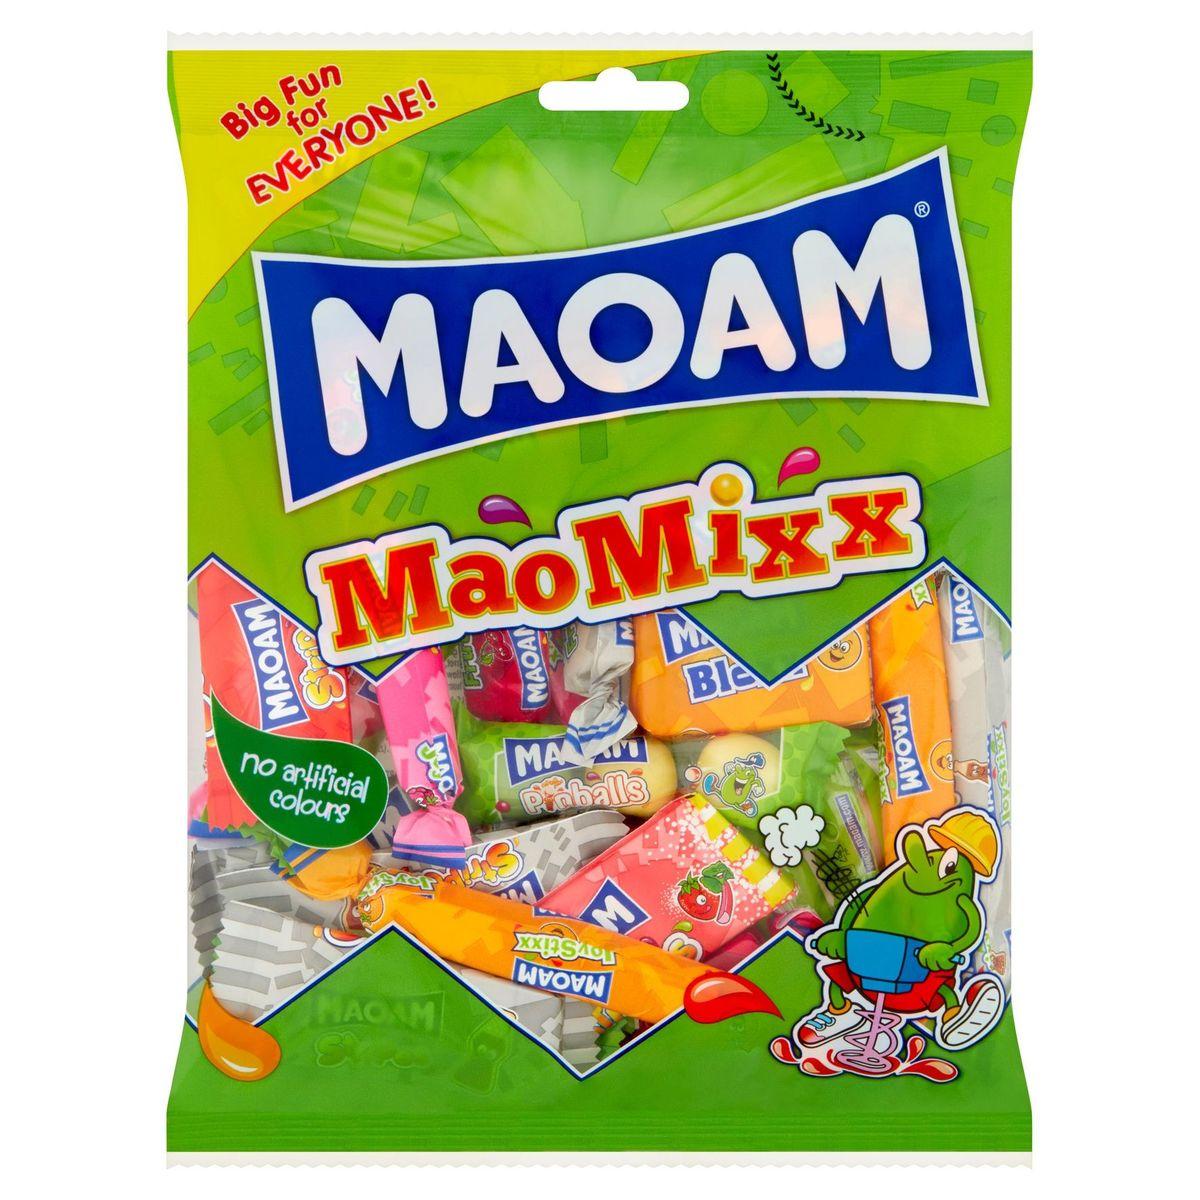 Maoam MaoMixx 250 g